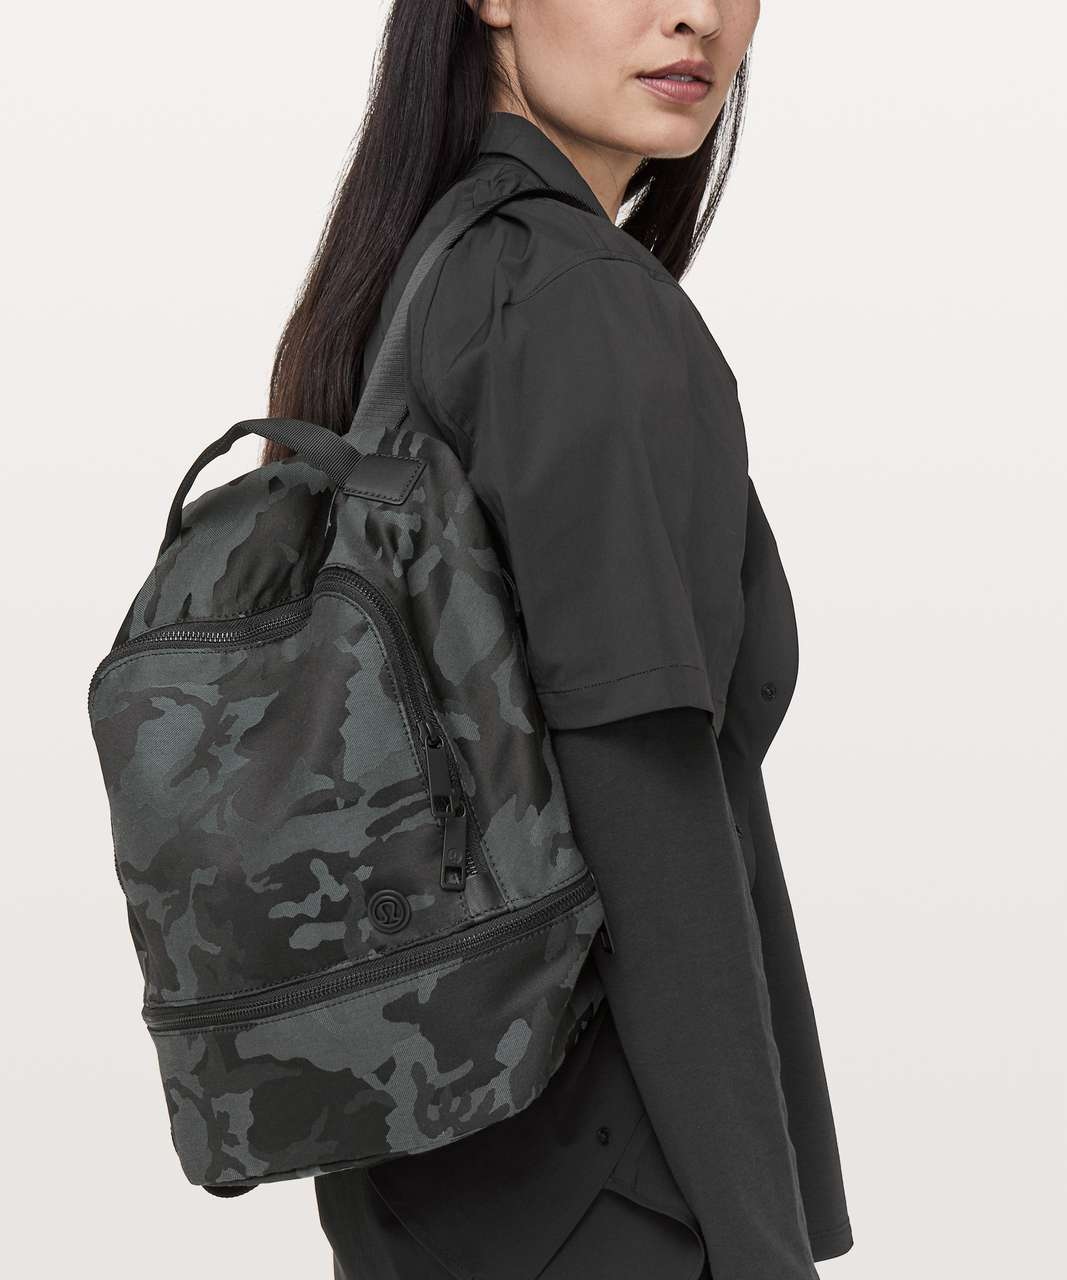 Lululemon City Adventurer Backpack Mini II *10L - Jacquard Camo Cotton Obsidian / Black